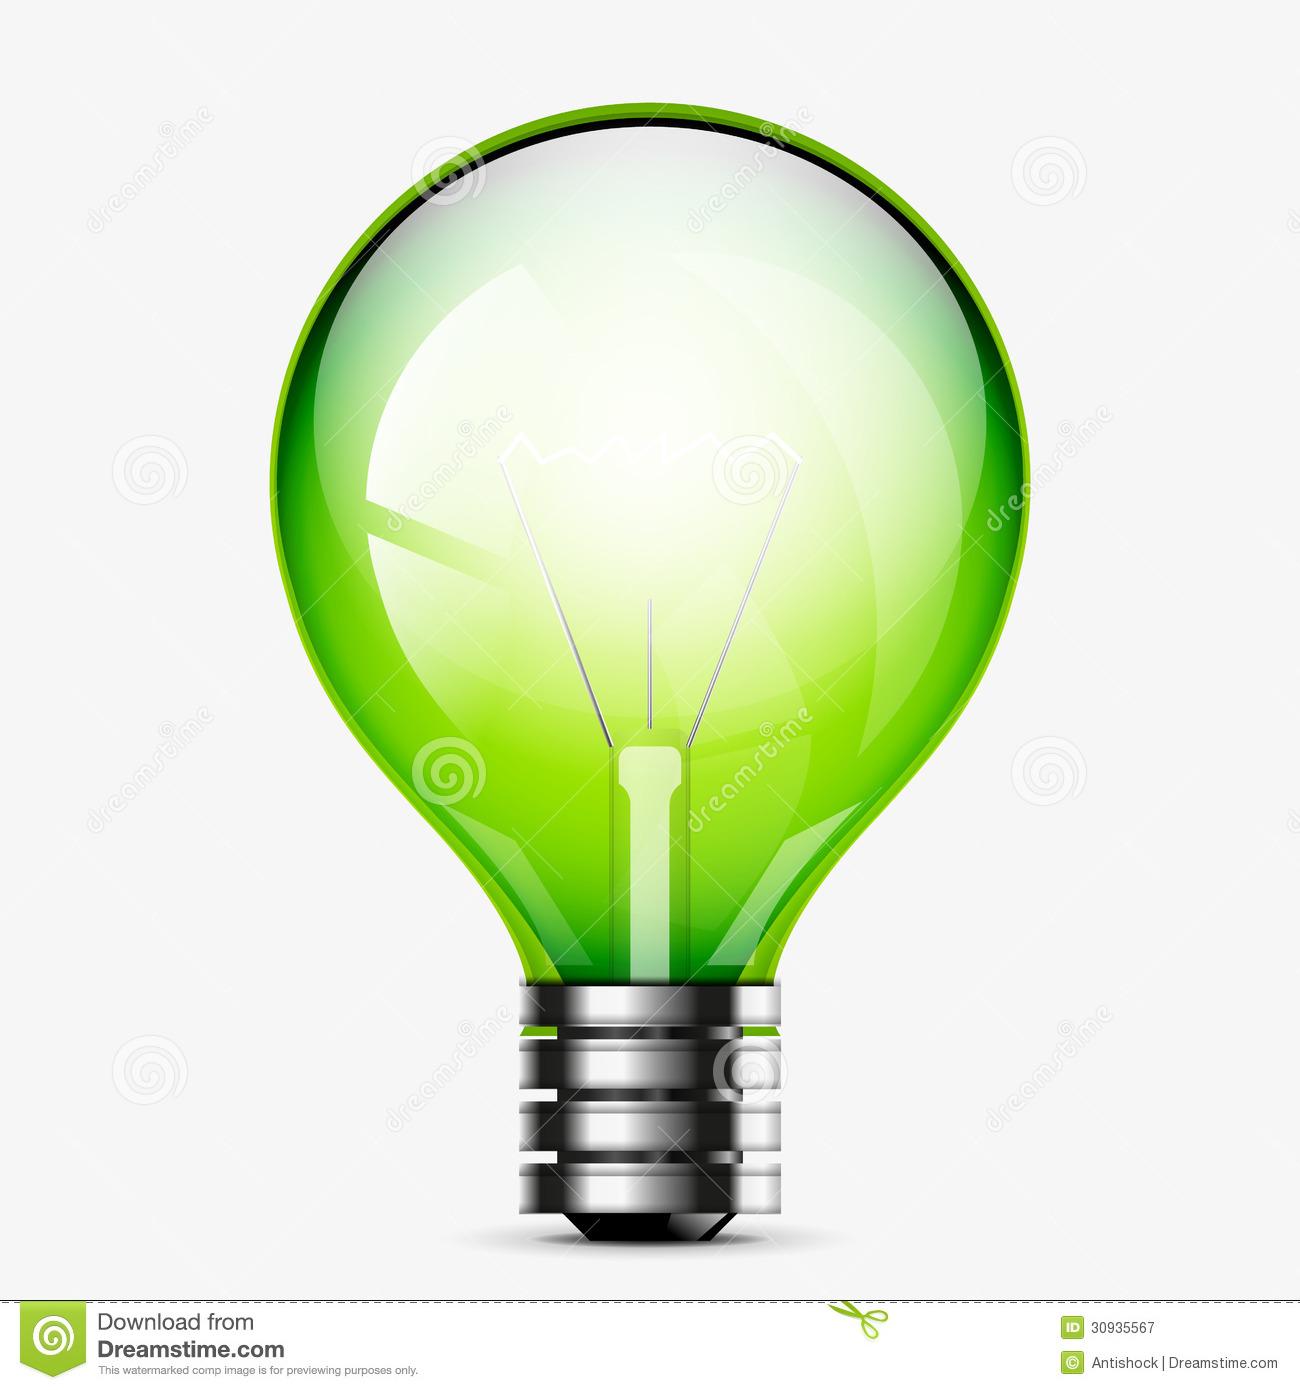 light-bulb-idea-icon-light-bulb-idea-icon-ltngpmgo jpgIdea Light Bulb